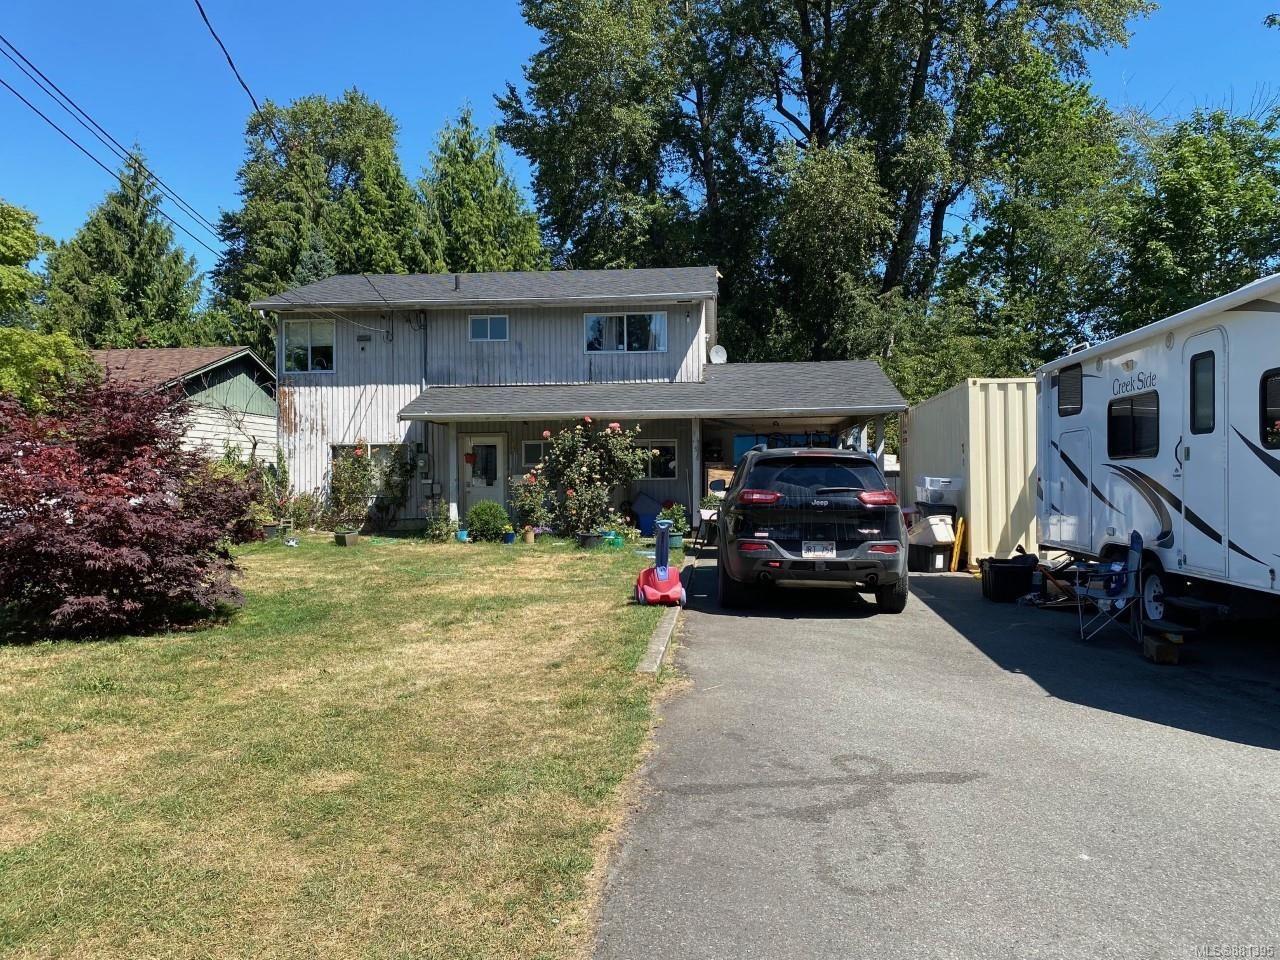 Main Photo: 454 Hewgate St in : Na South Nanaimo House for sale (Nanaimo)  : MLS®# 881395